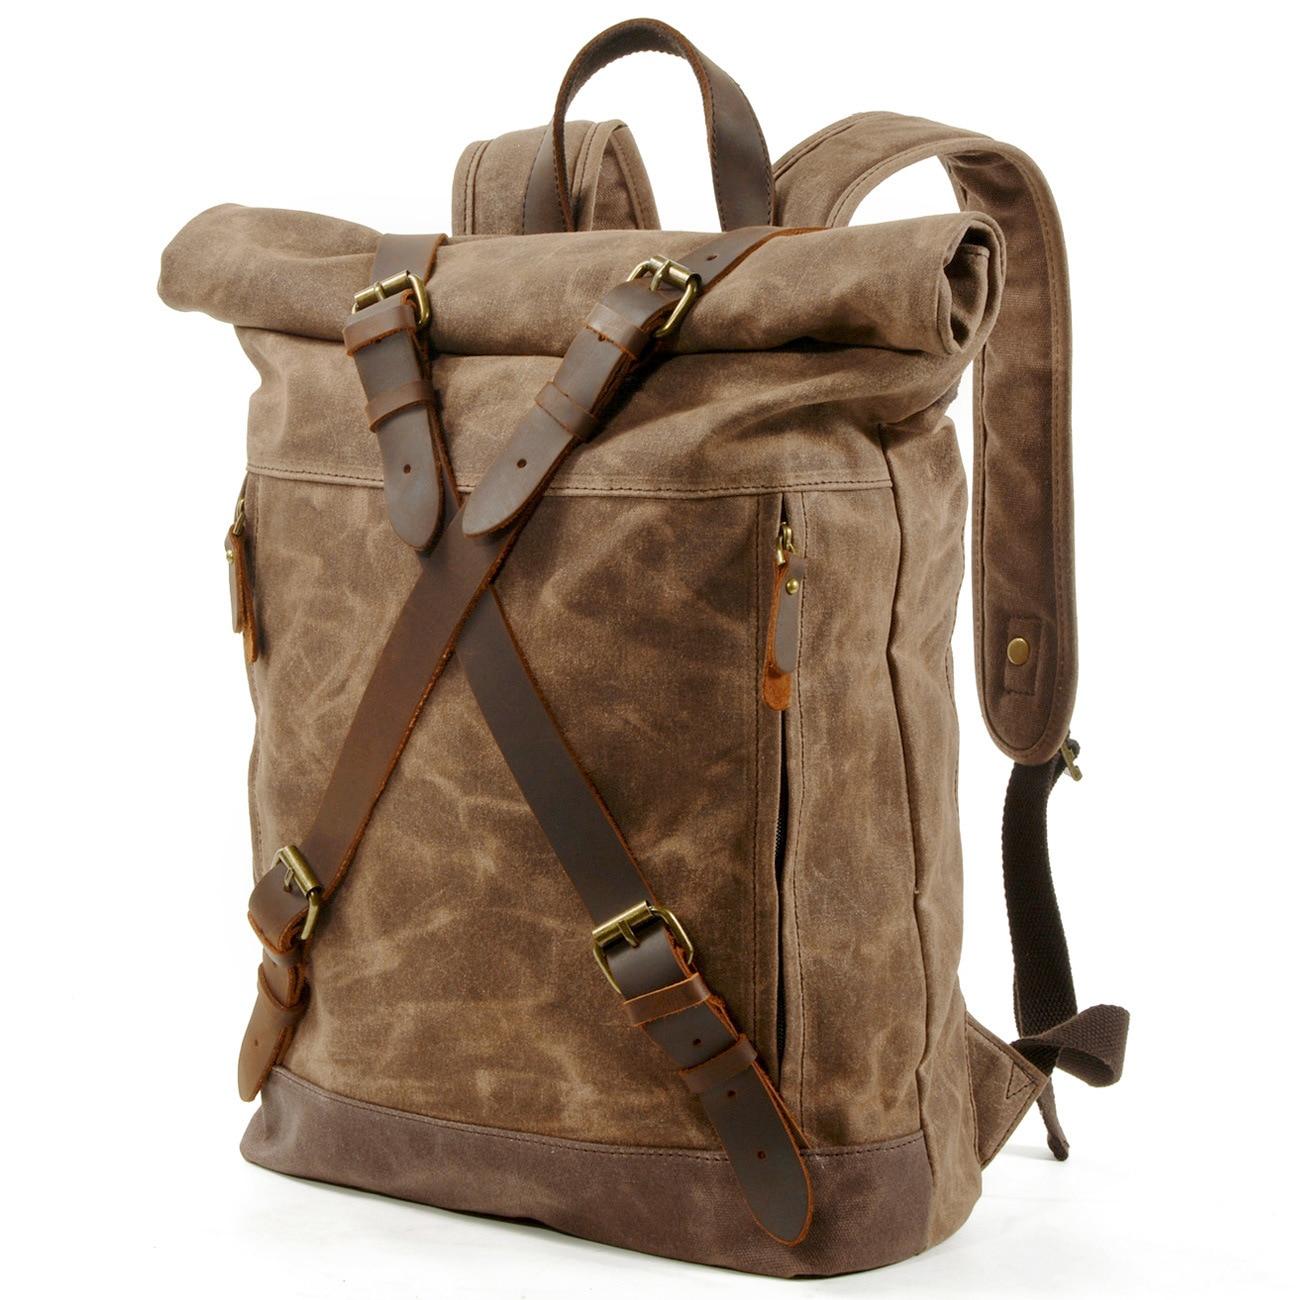 Waxed Canvas Rolltop Backpacks Large Capacity Men Laptop Leather College Travel Vintage Weekend Waterproof Anti-theft Rucksack